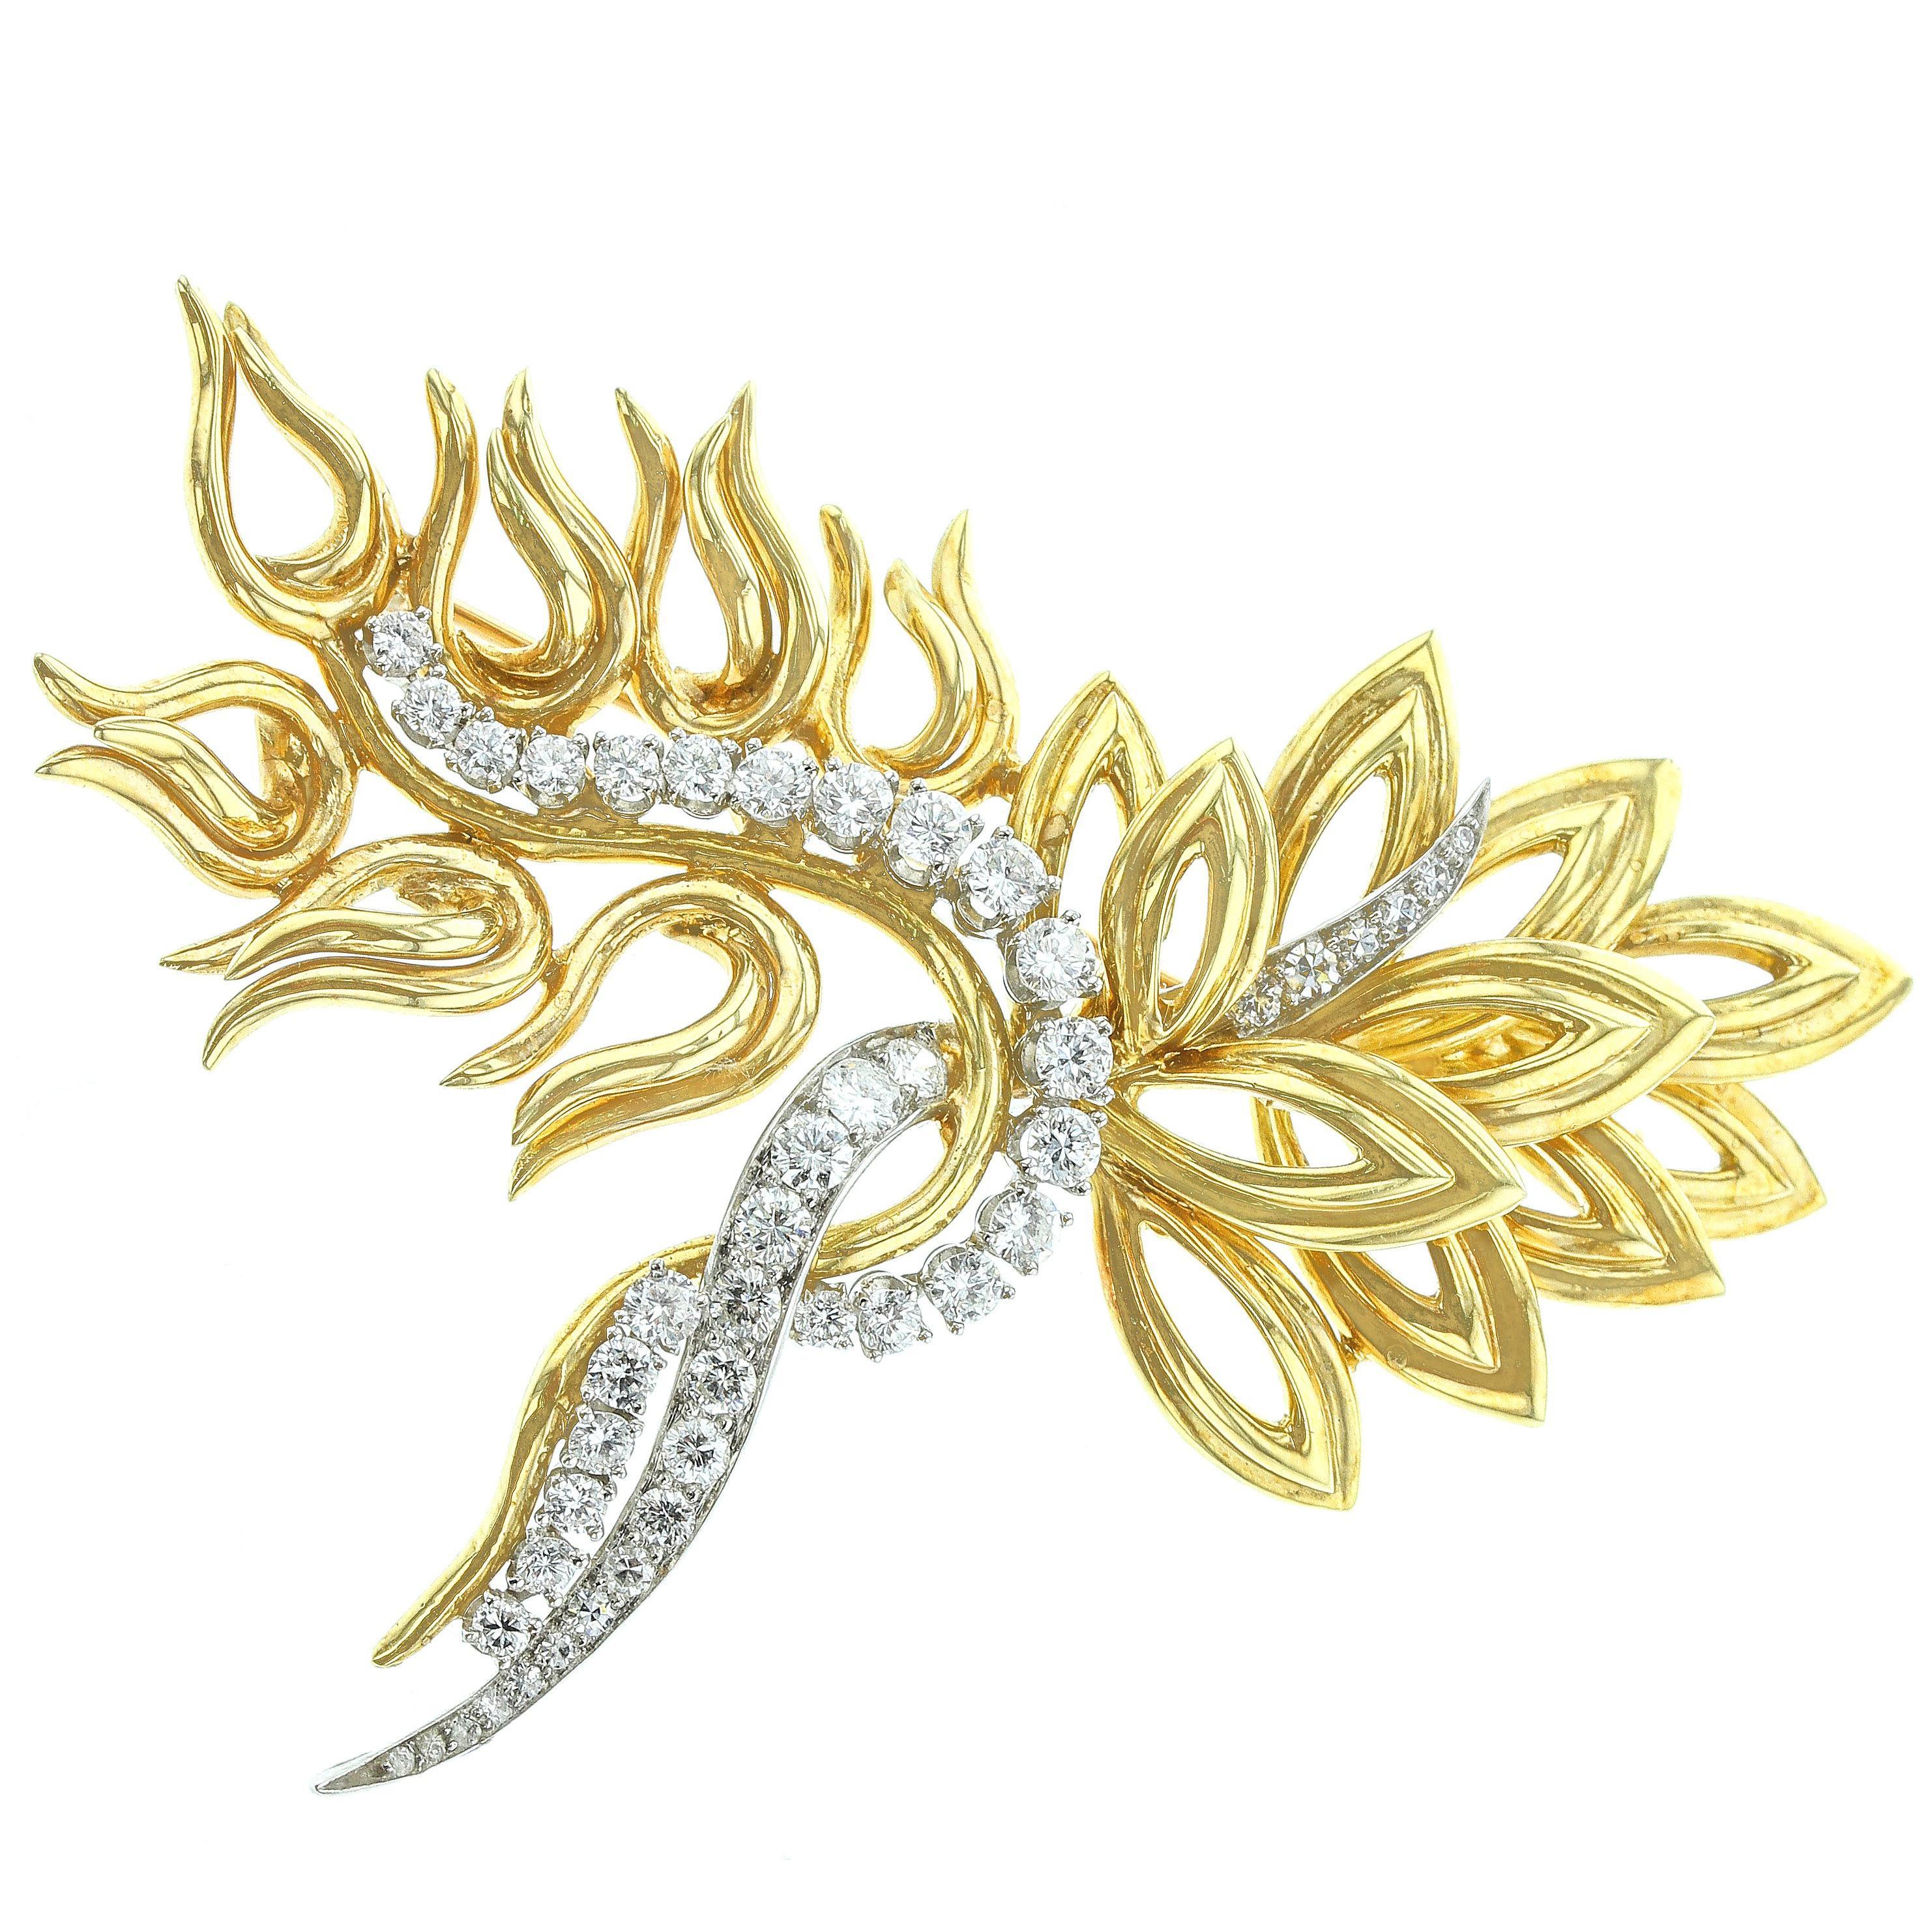 Abstract 18 Karat Yellow Gold, Platinum and Diamond Pin Retailed, Harry Winston